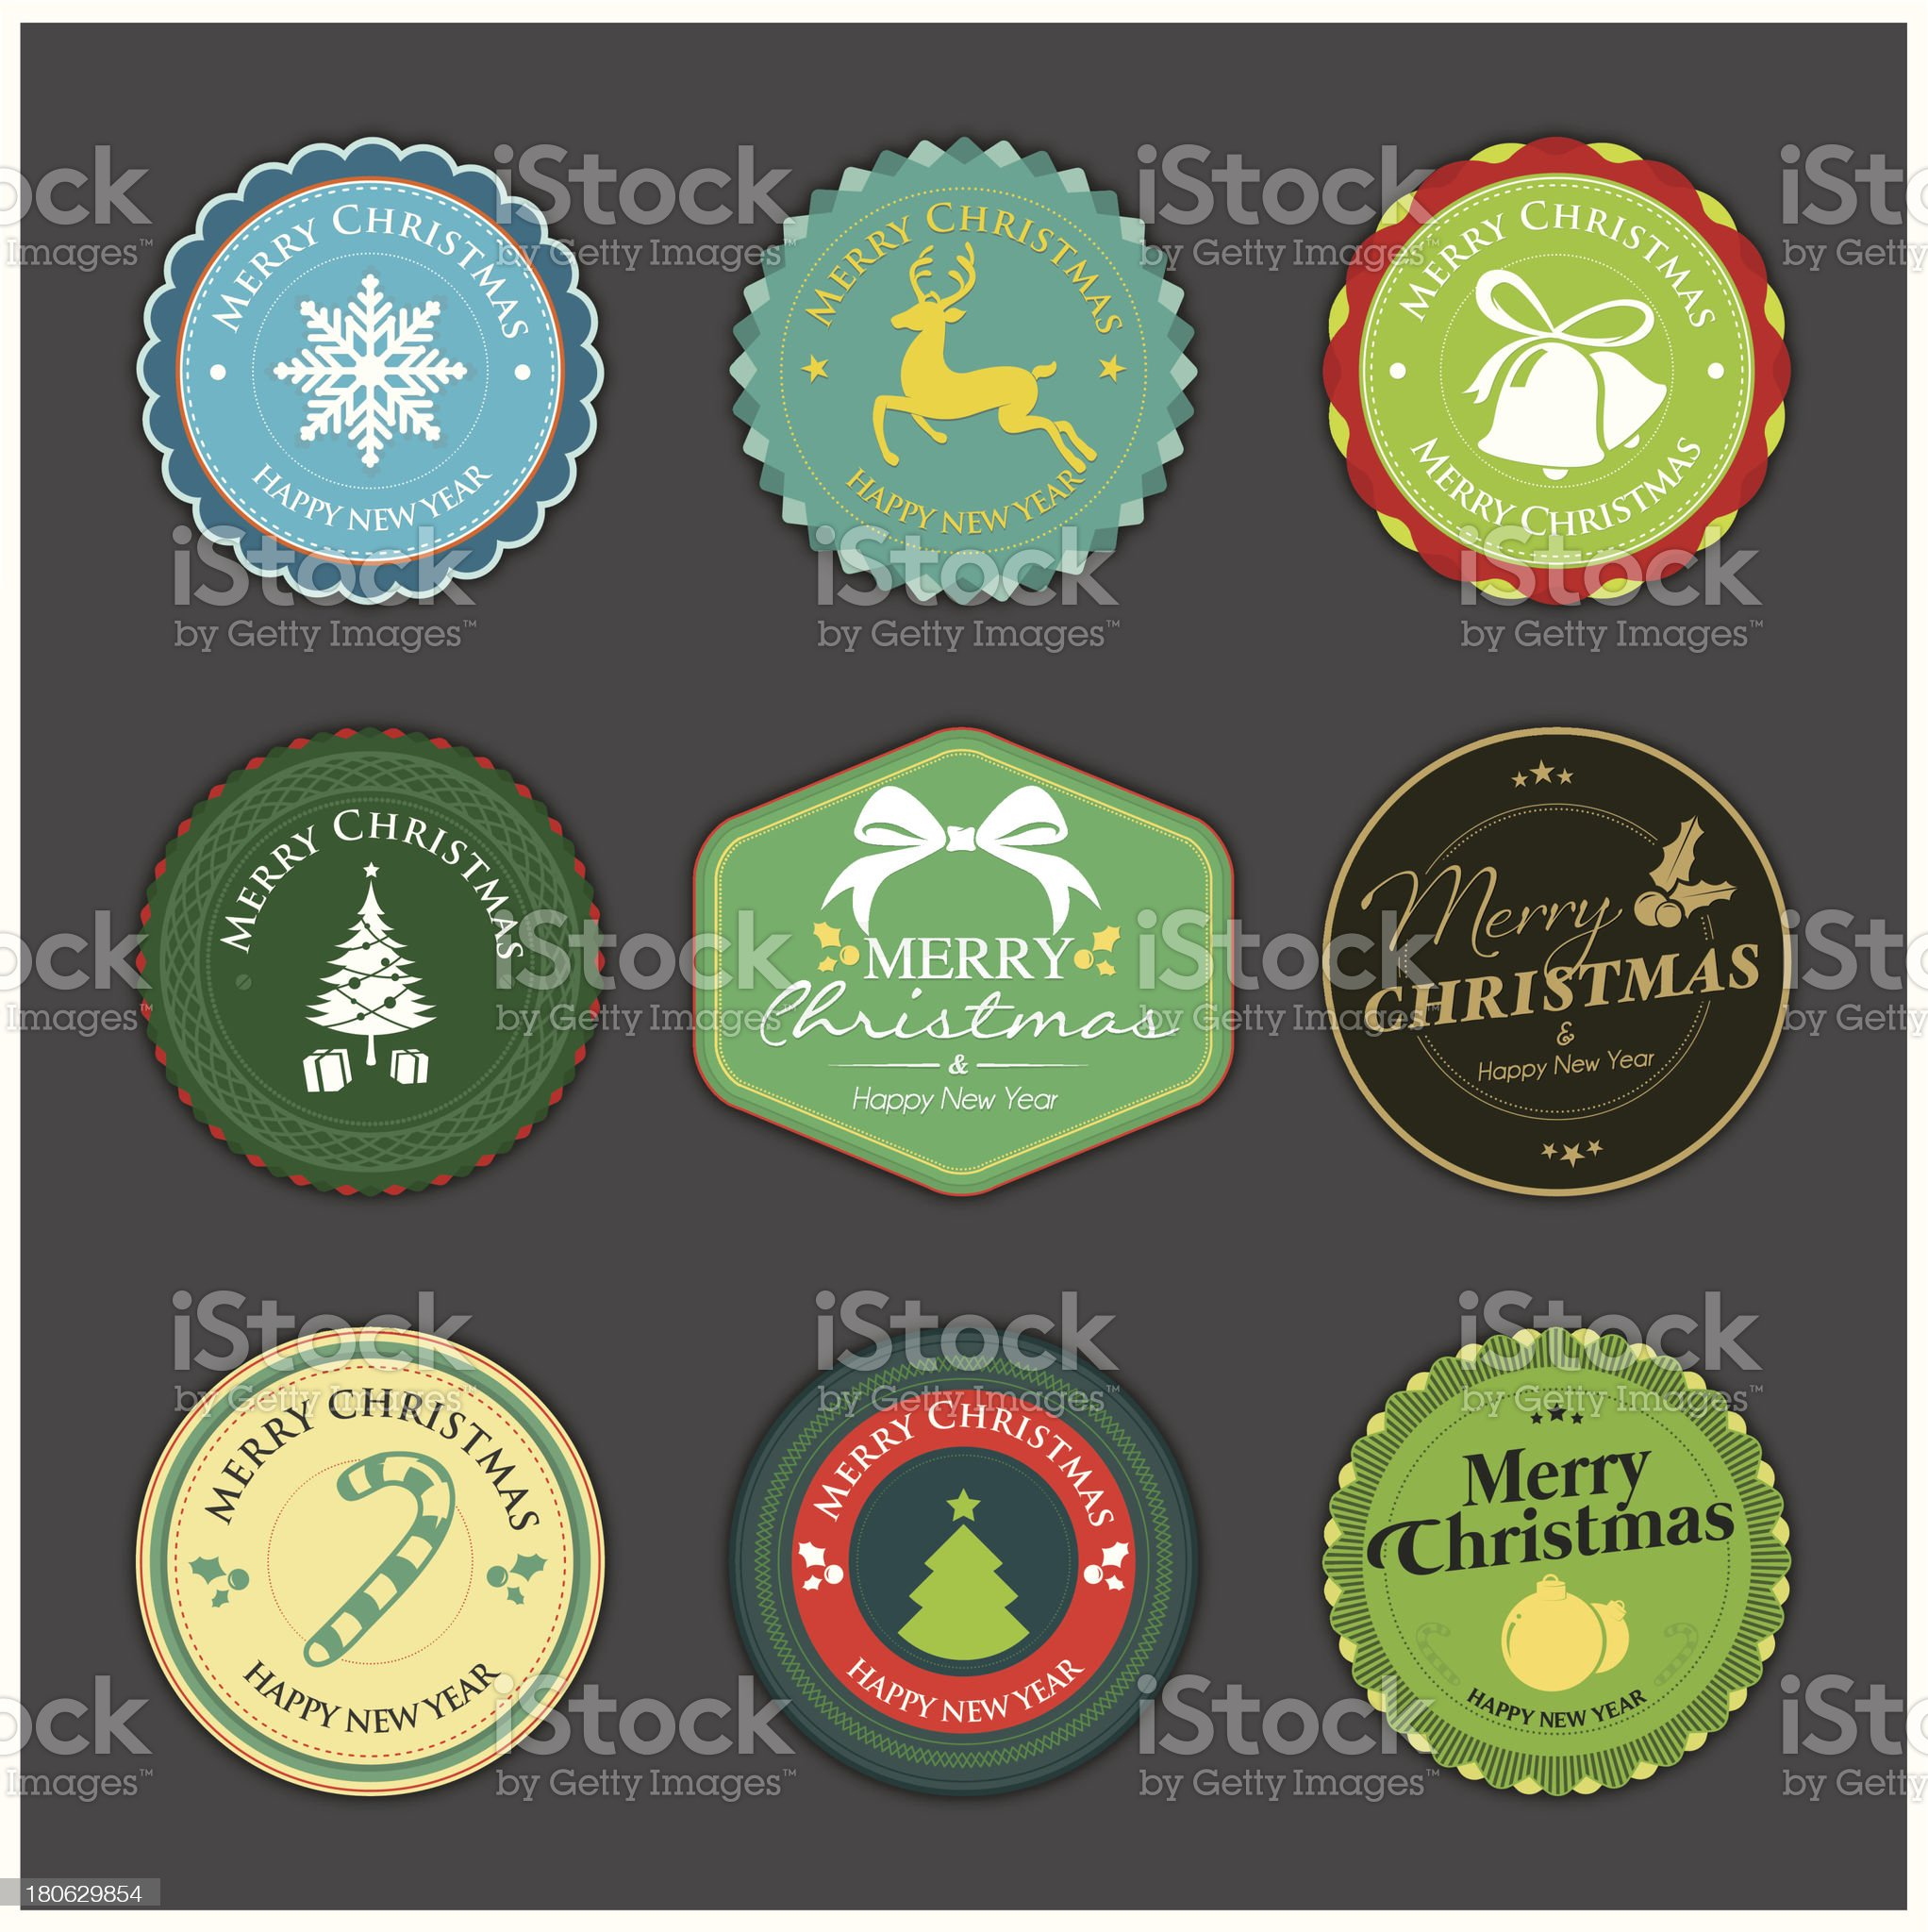 Modern colourful christmas badges royalty-free stock vector art